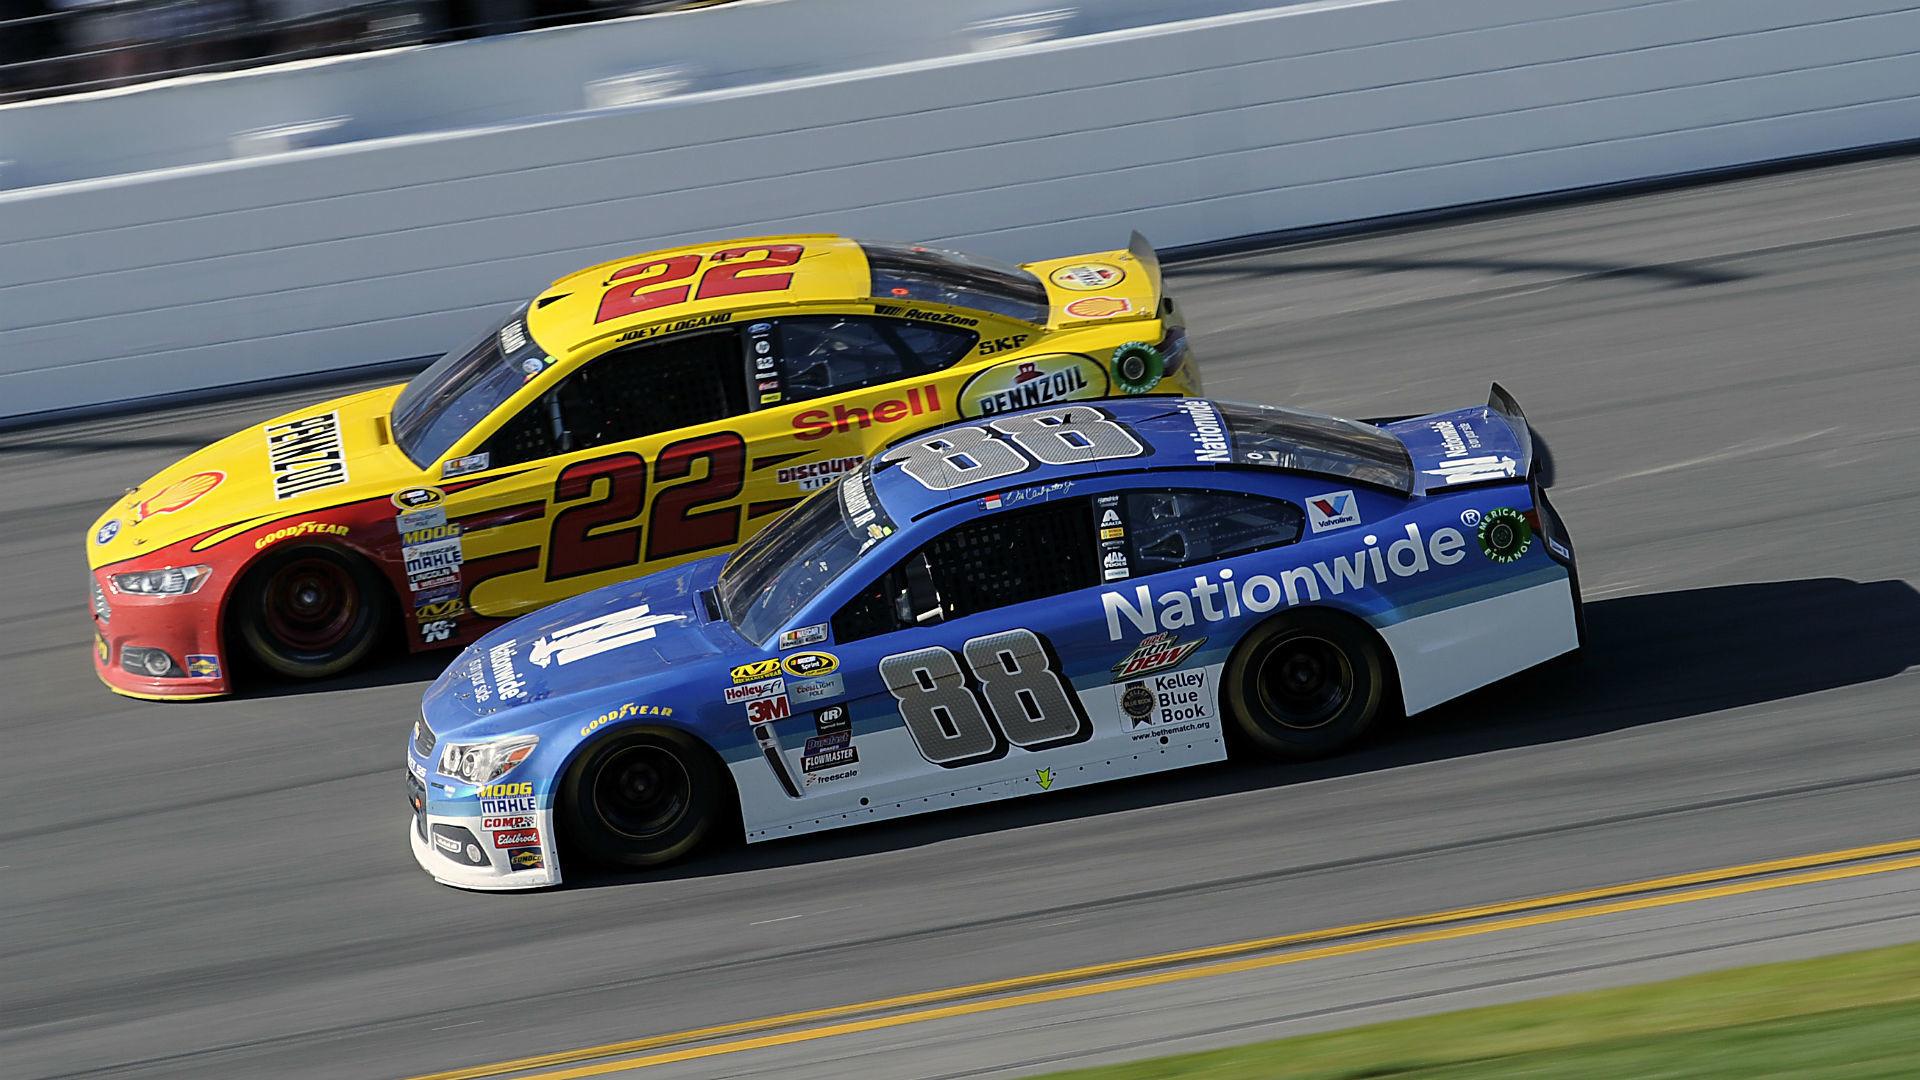 Forget Batman, Dale Earnhardt Jr. names his Daytona car after a real hero |  NASCAR | Sporting News